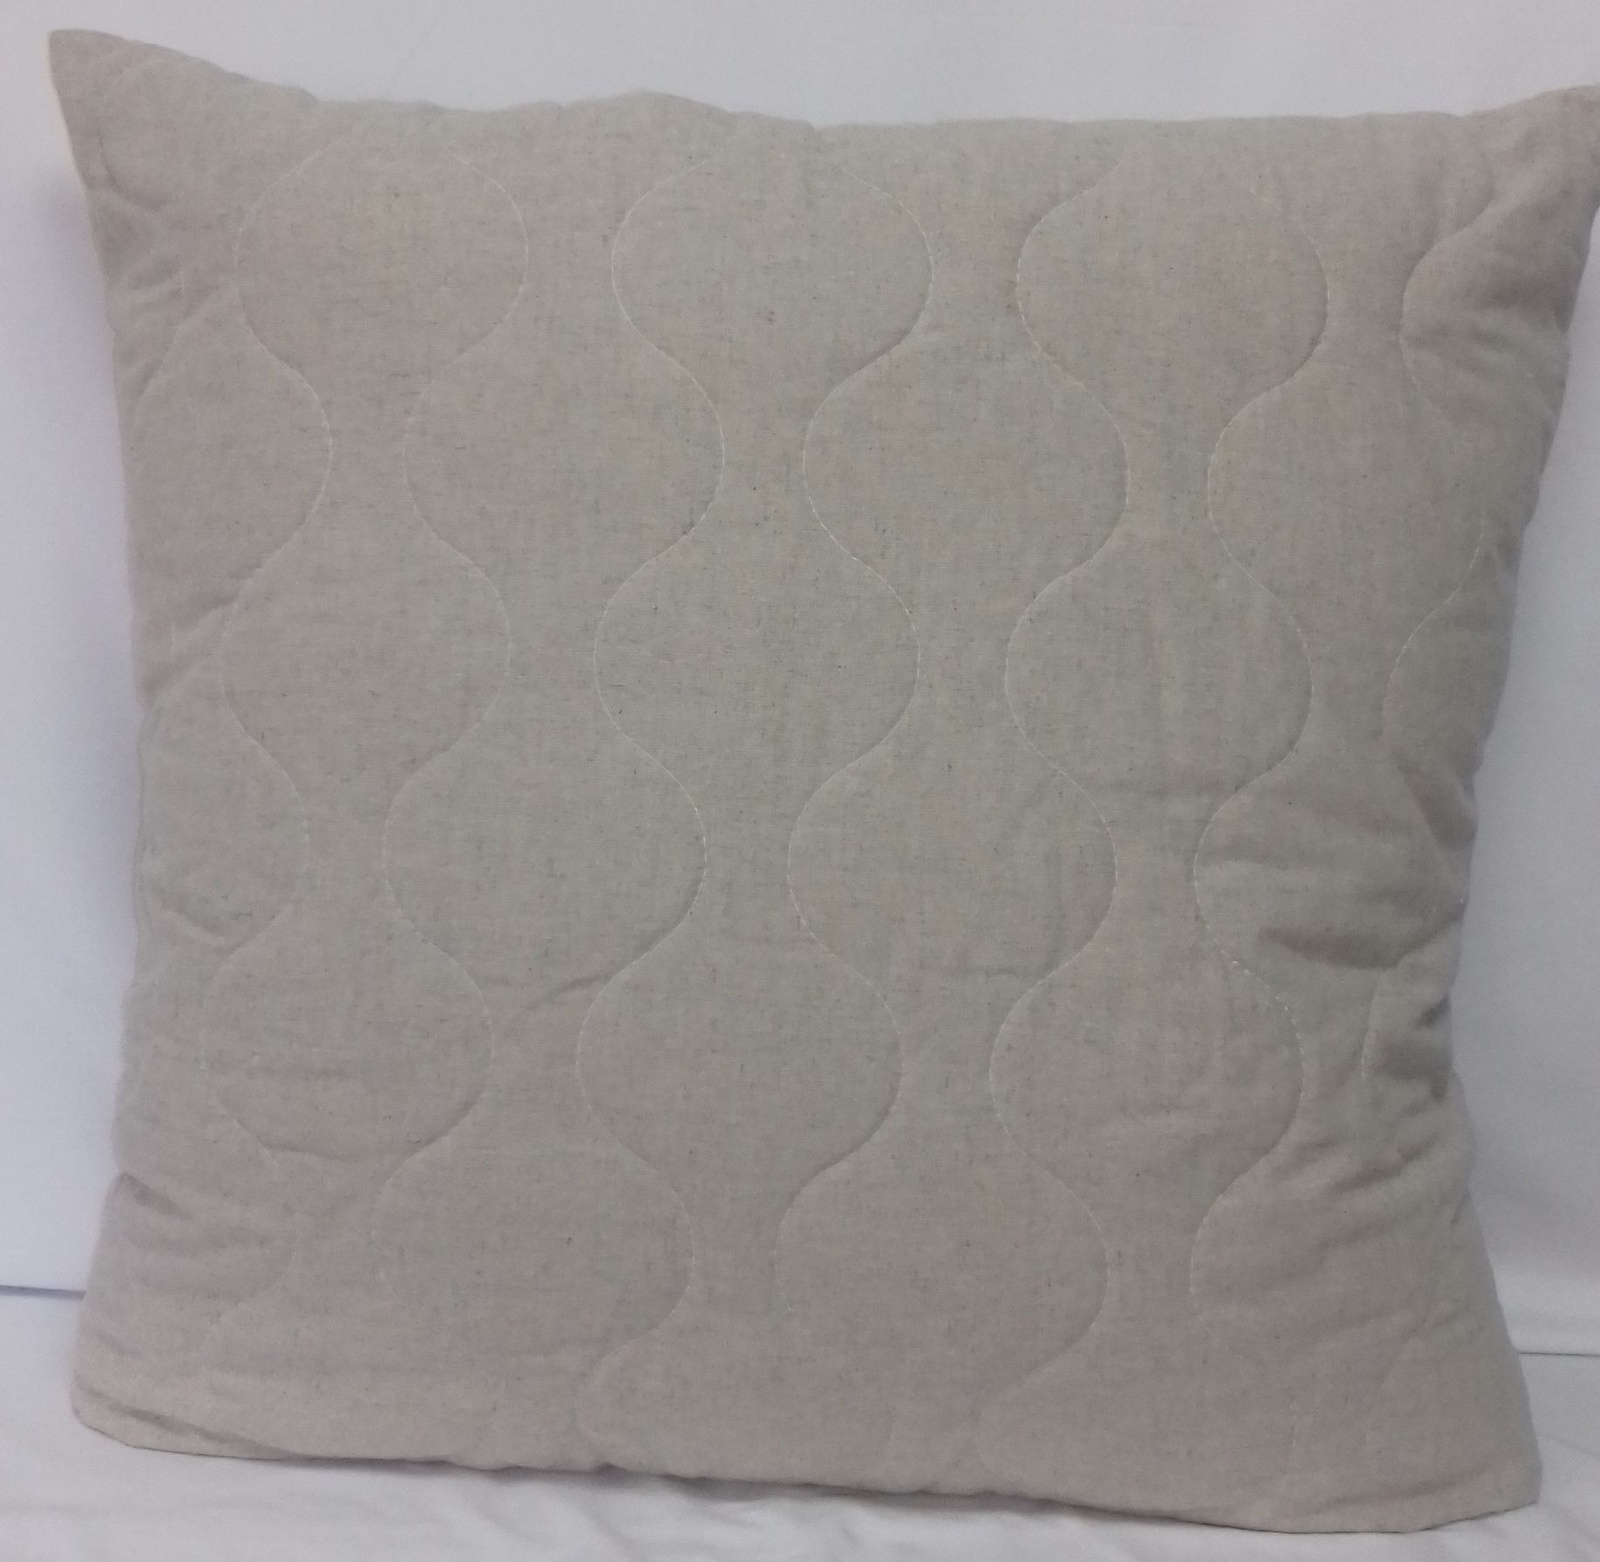 Подушка Лен Альвитек, размер 70 х 70 подушка green line лен наполнитель льняное волокно 70 х 70 см